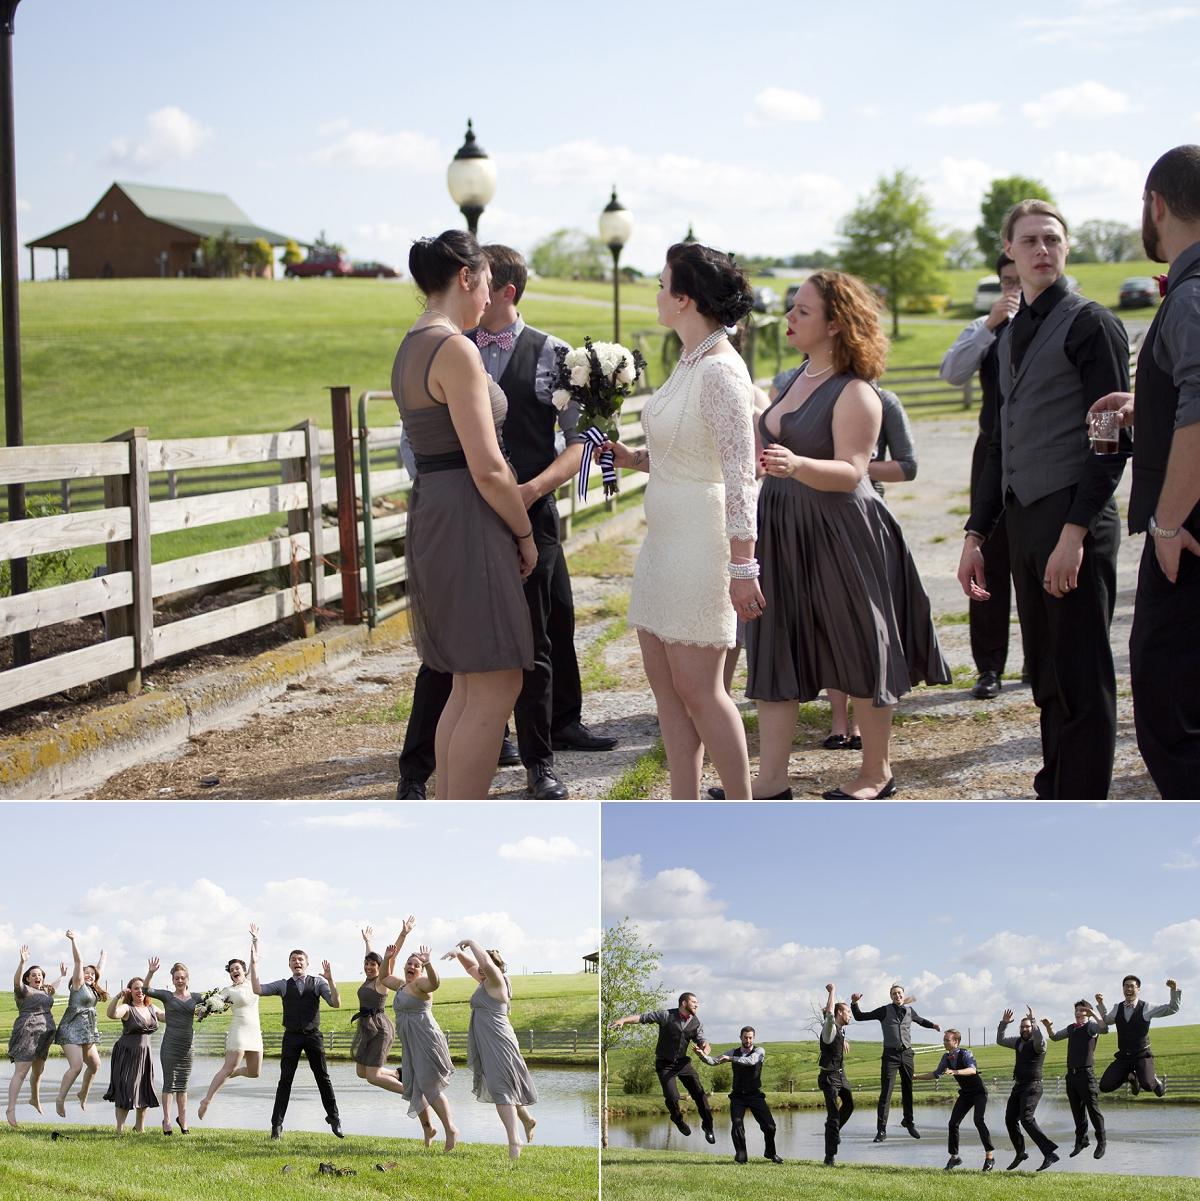 Sinkland-Farms-Christiansburg-Vintage-Circus-Wedding-_0015.jpg